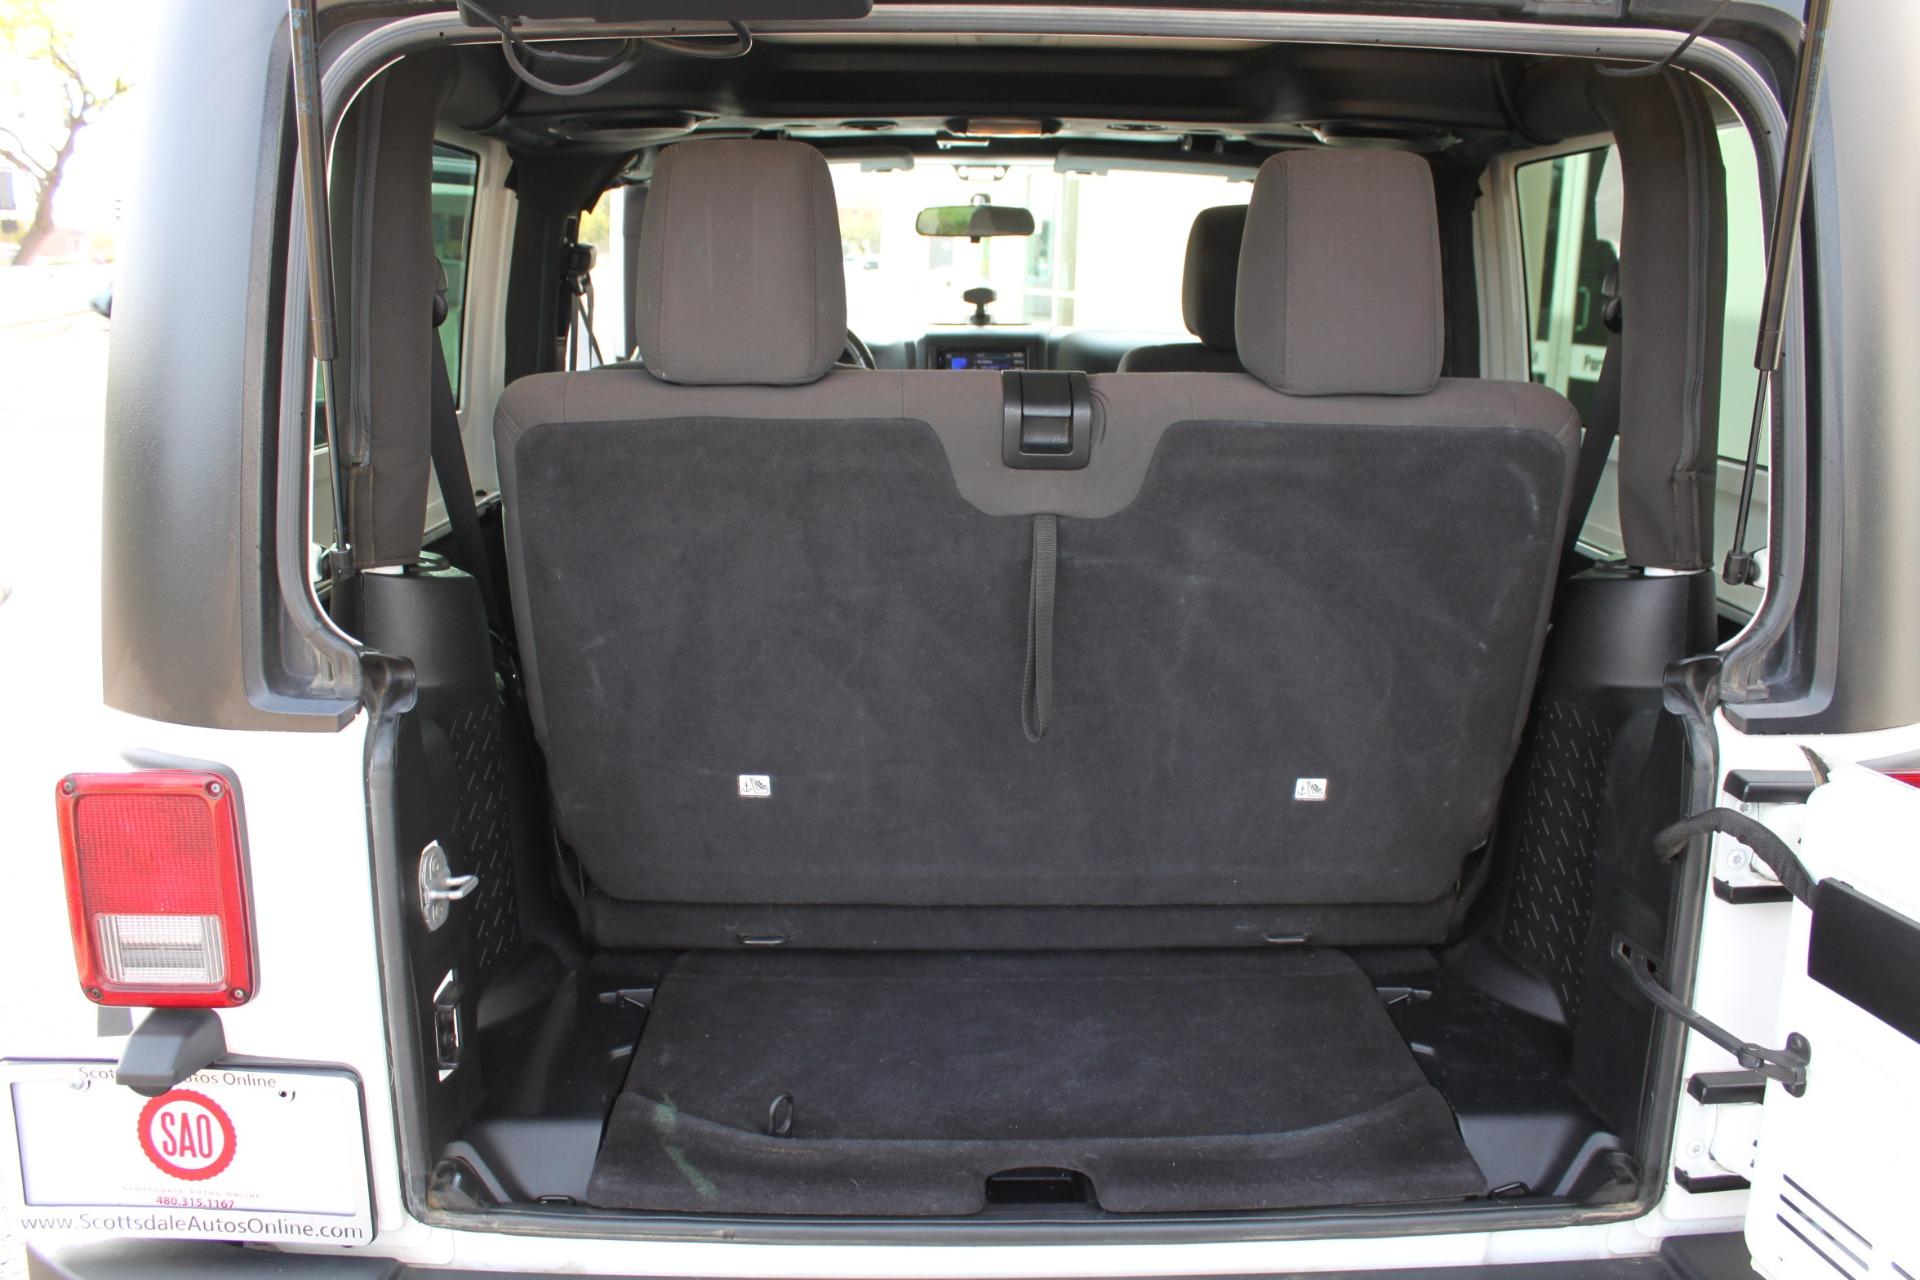 Used-2012-Jeep-Wrangler-Freedom-Edition-4X4-Classic